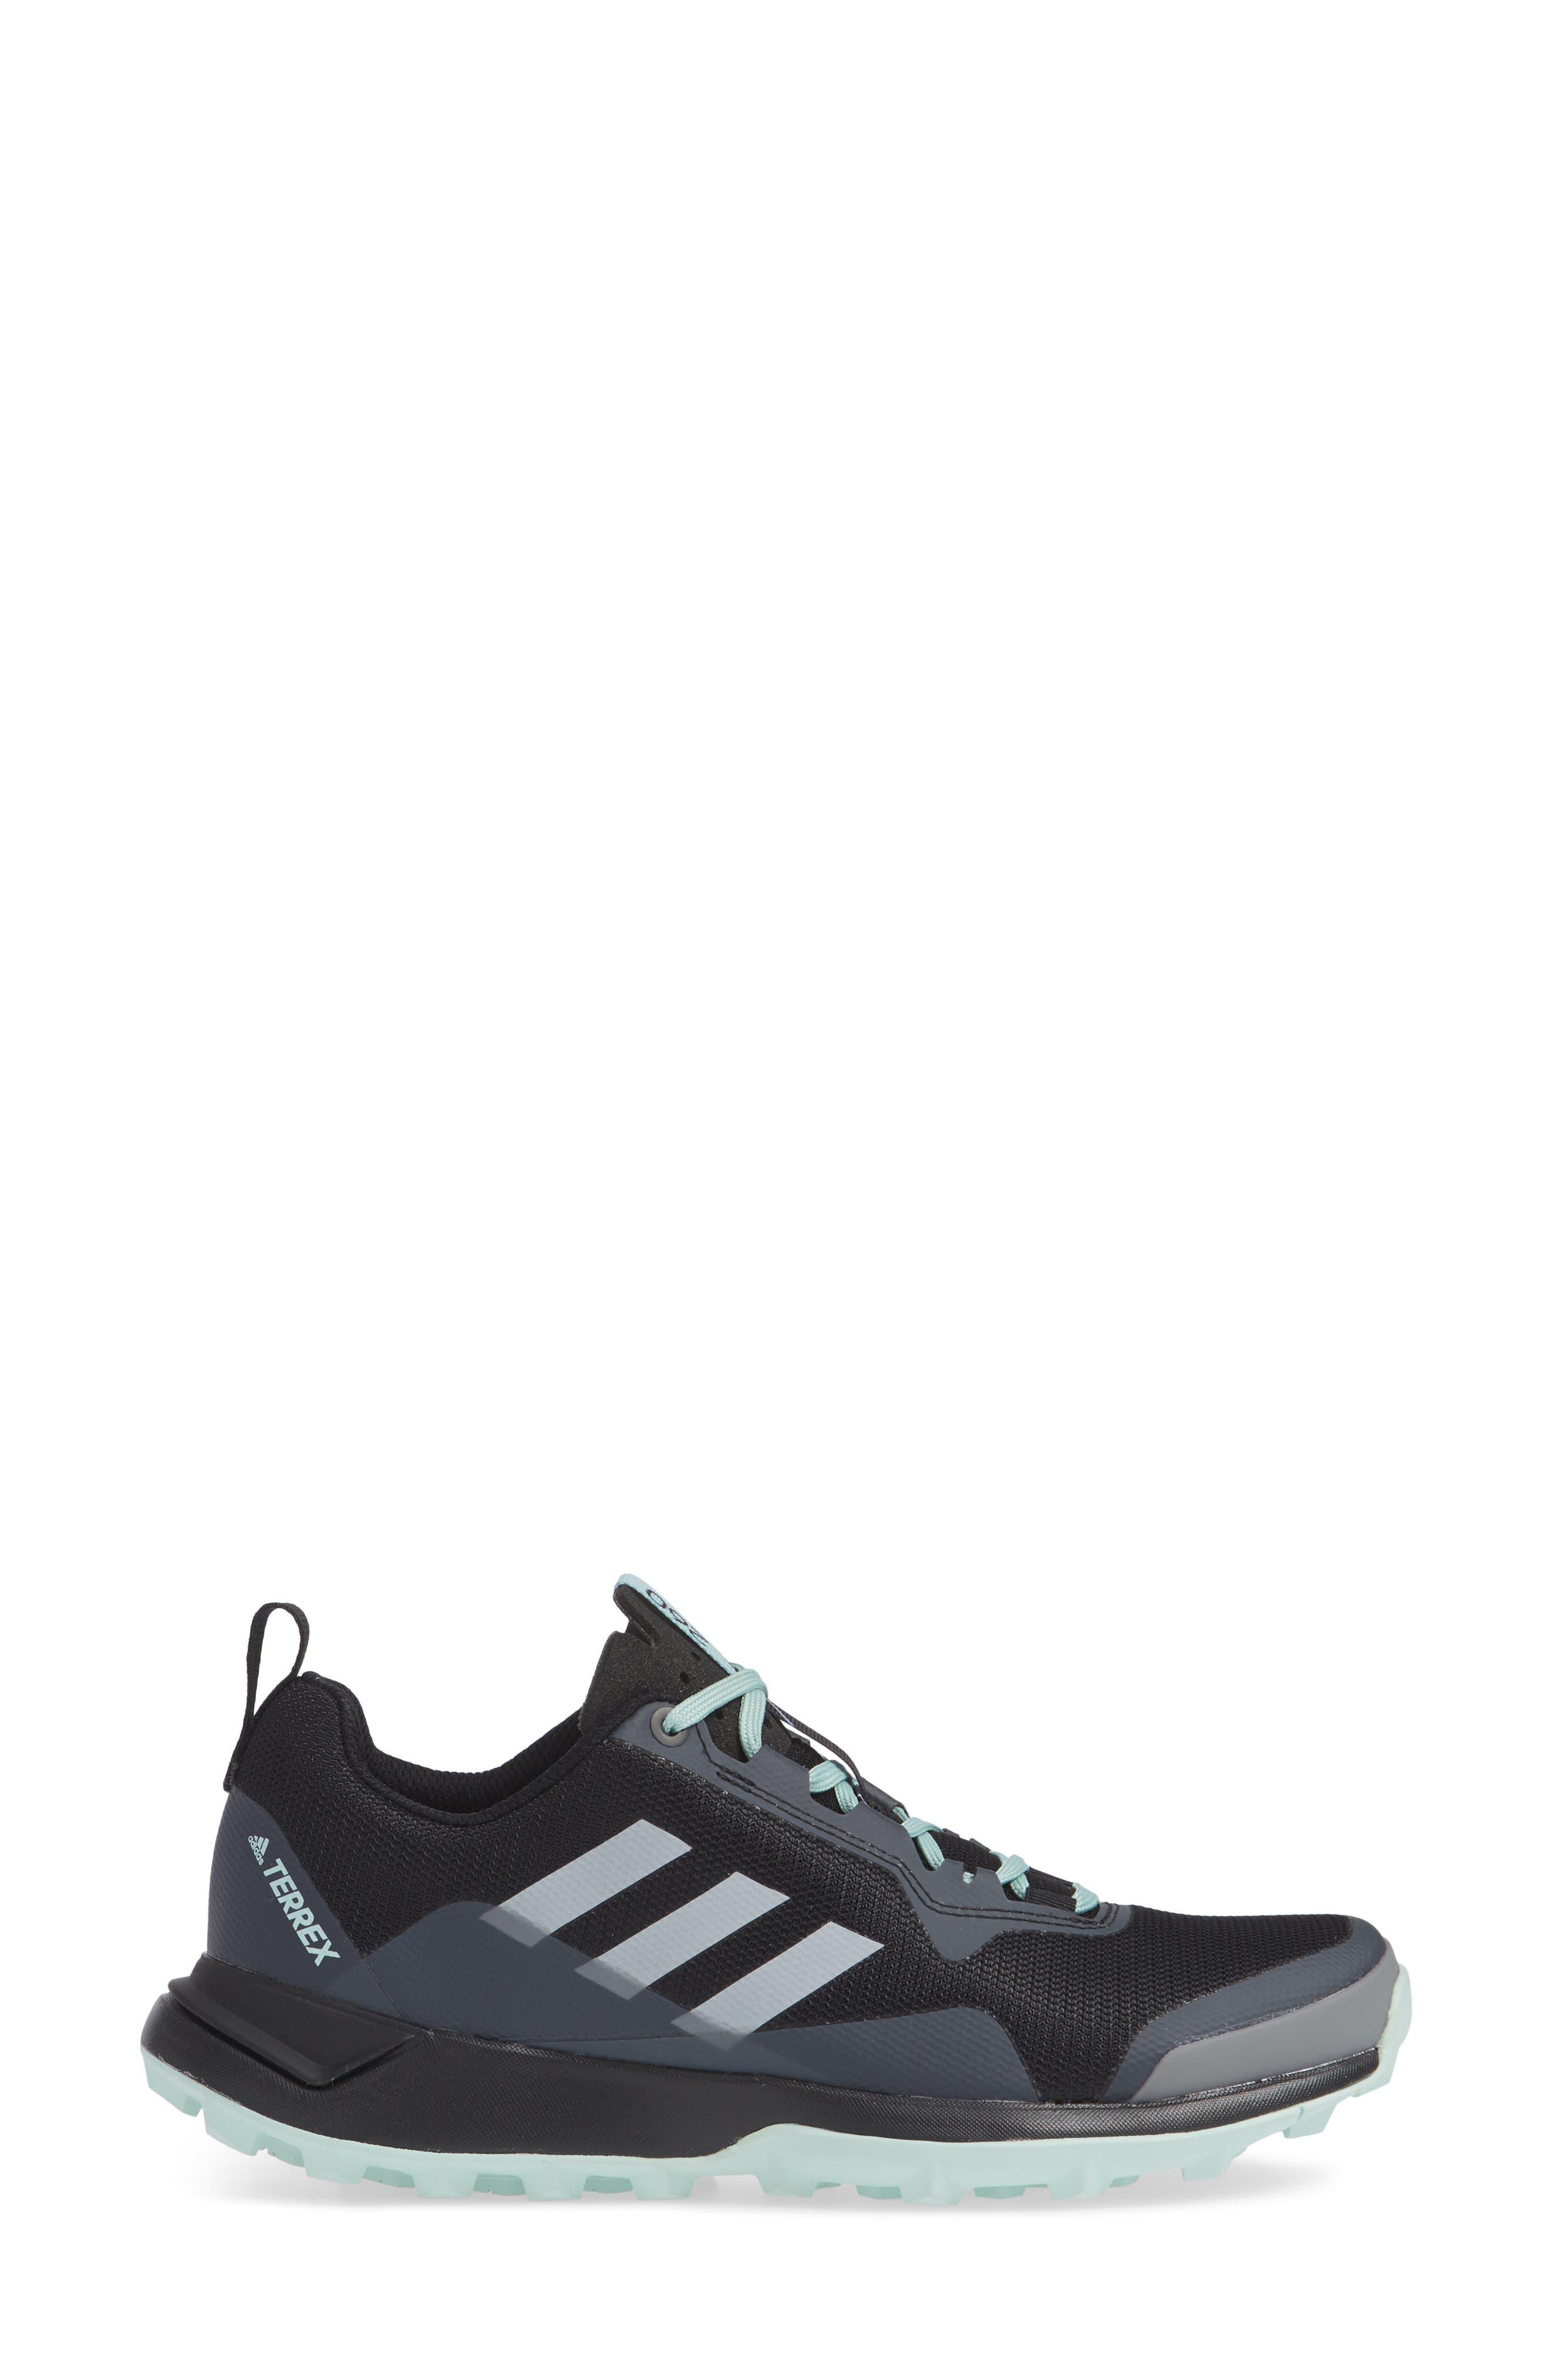 Terrex CMTK Gore-Tex<sup>®</sup> Waterproof Hiking Sneaker,                             Alternate thumbnail 3, color,                             BLACK/ CHALK WHITE/ ASH GREEN